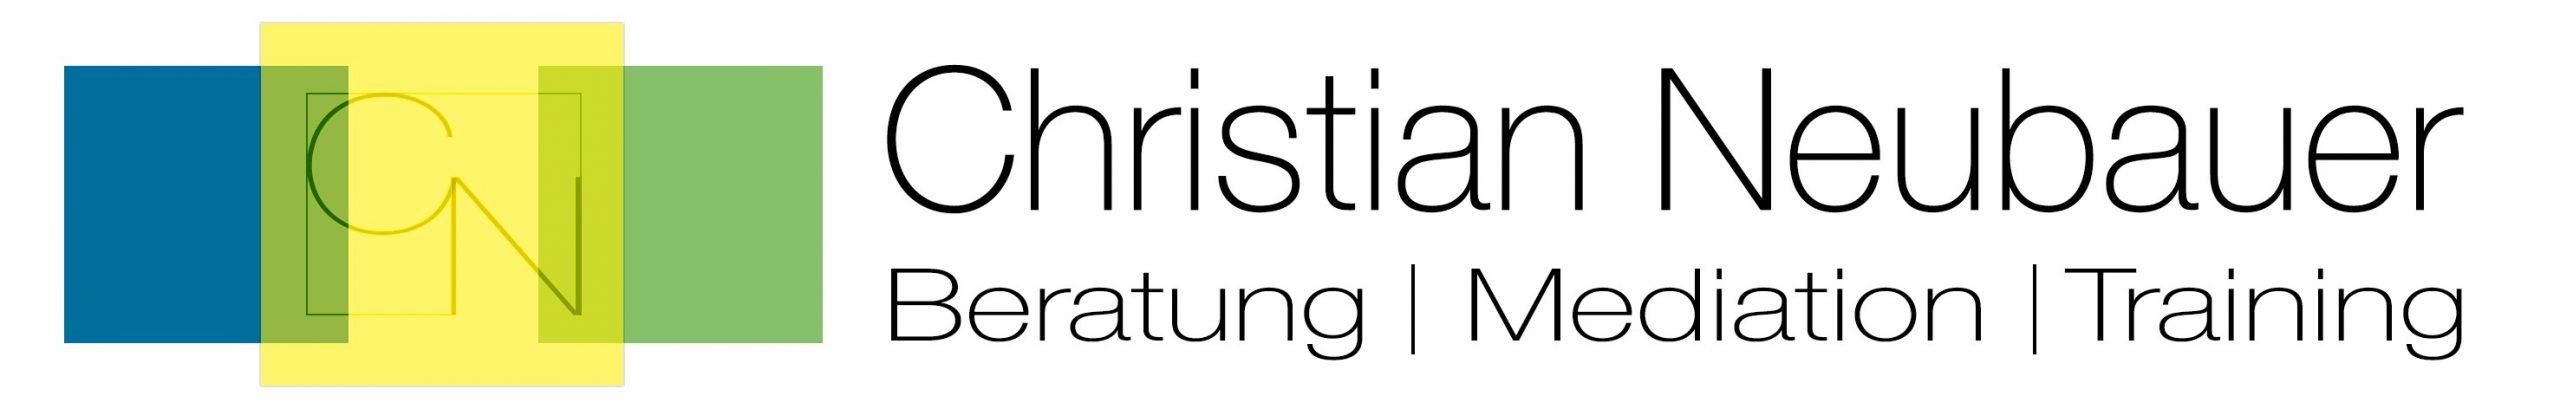 Christan Neubauer